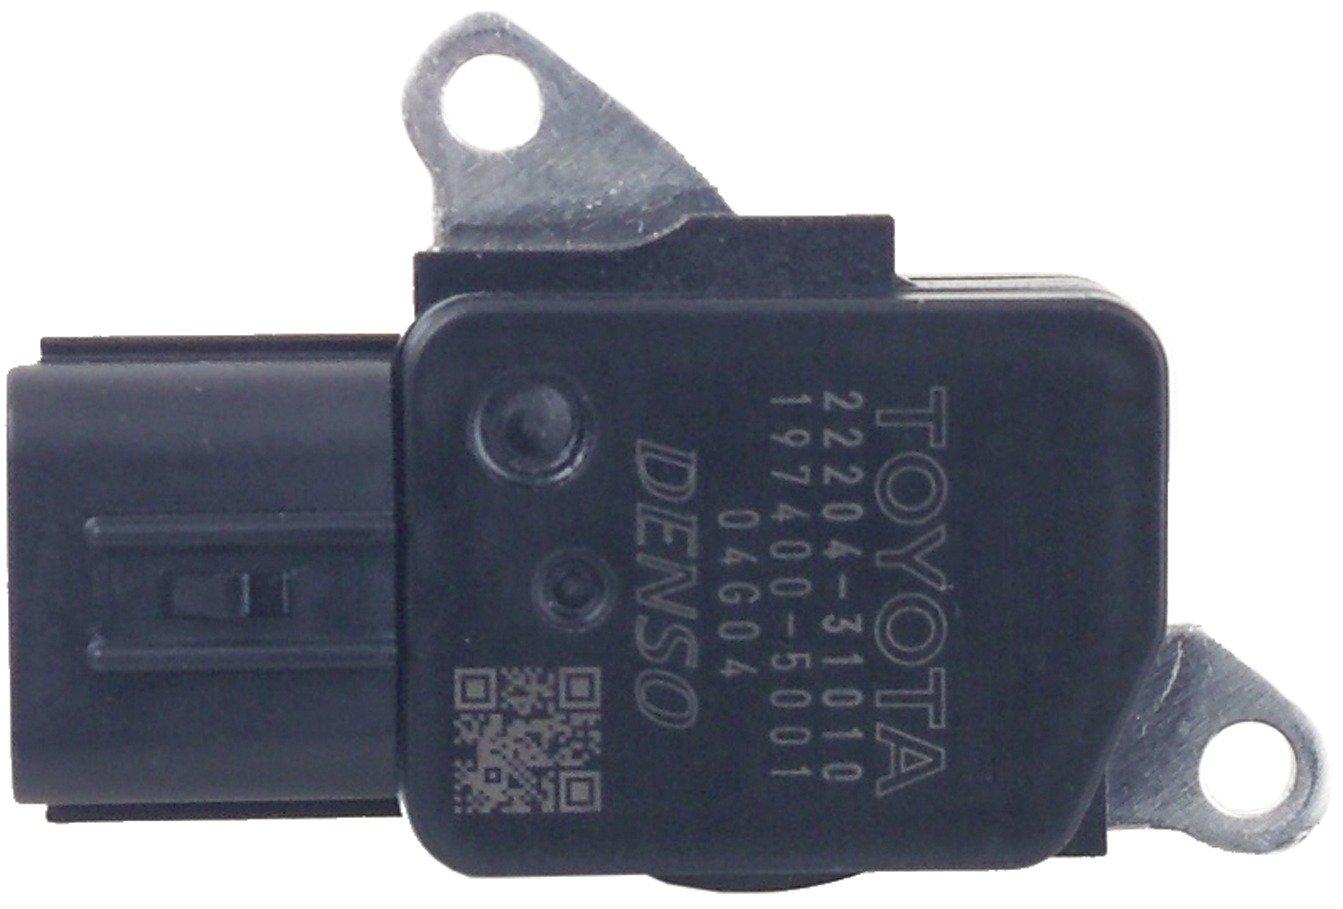 Cardone 74-50057 Remanufactured Mass Airflow Sensor (MAFS) A174-50057